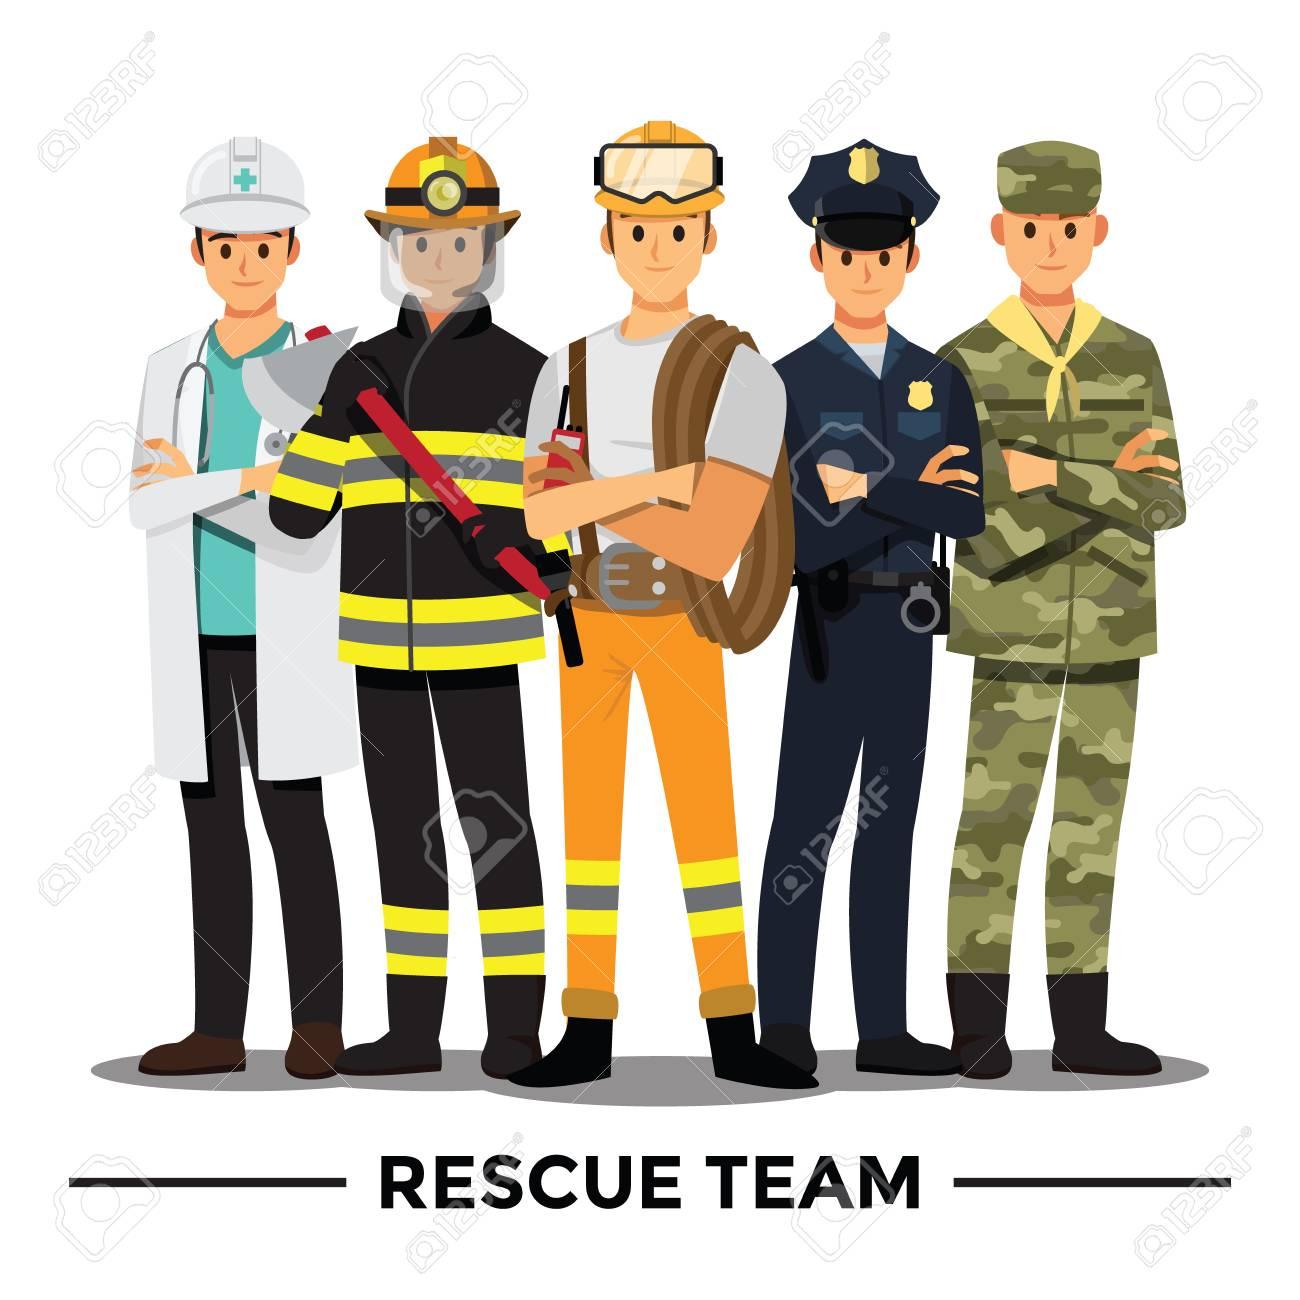 Rescue team cartoon character. - 108190958